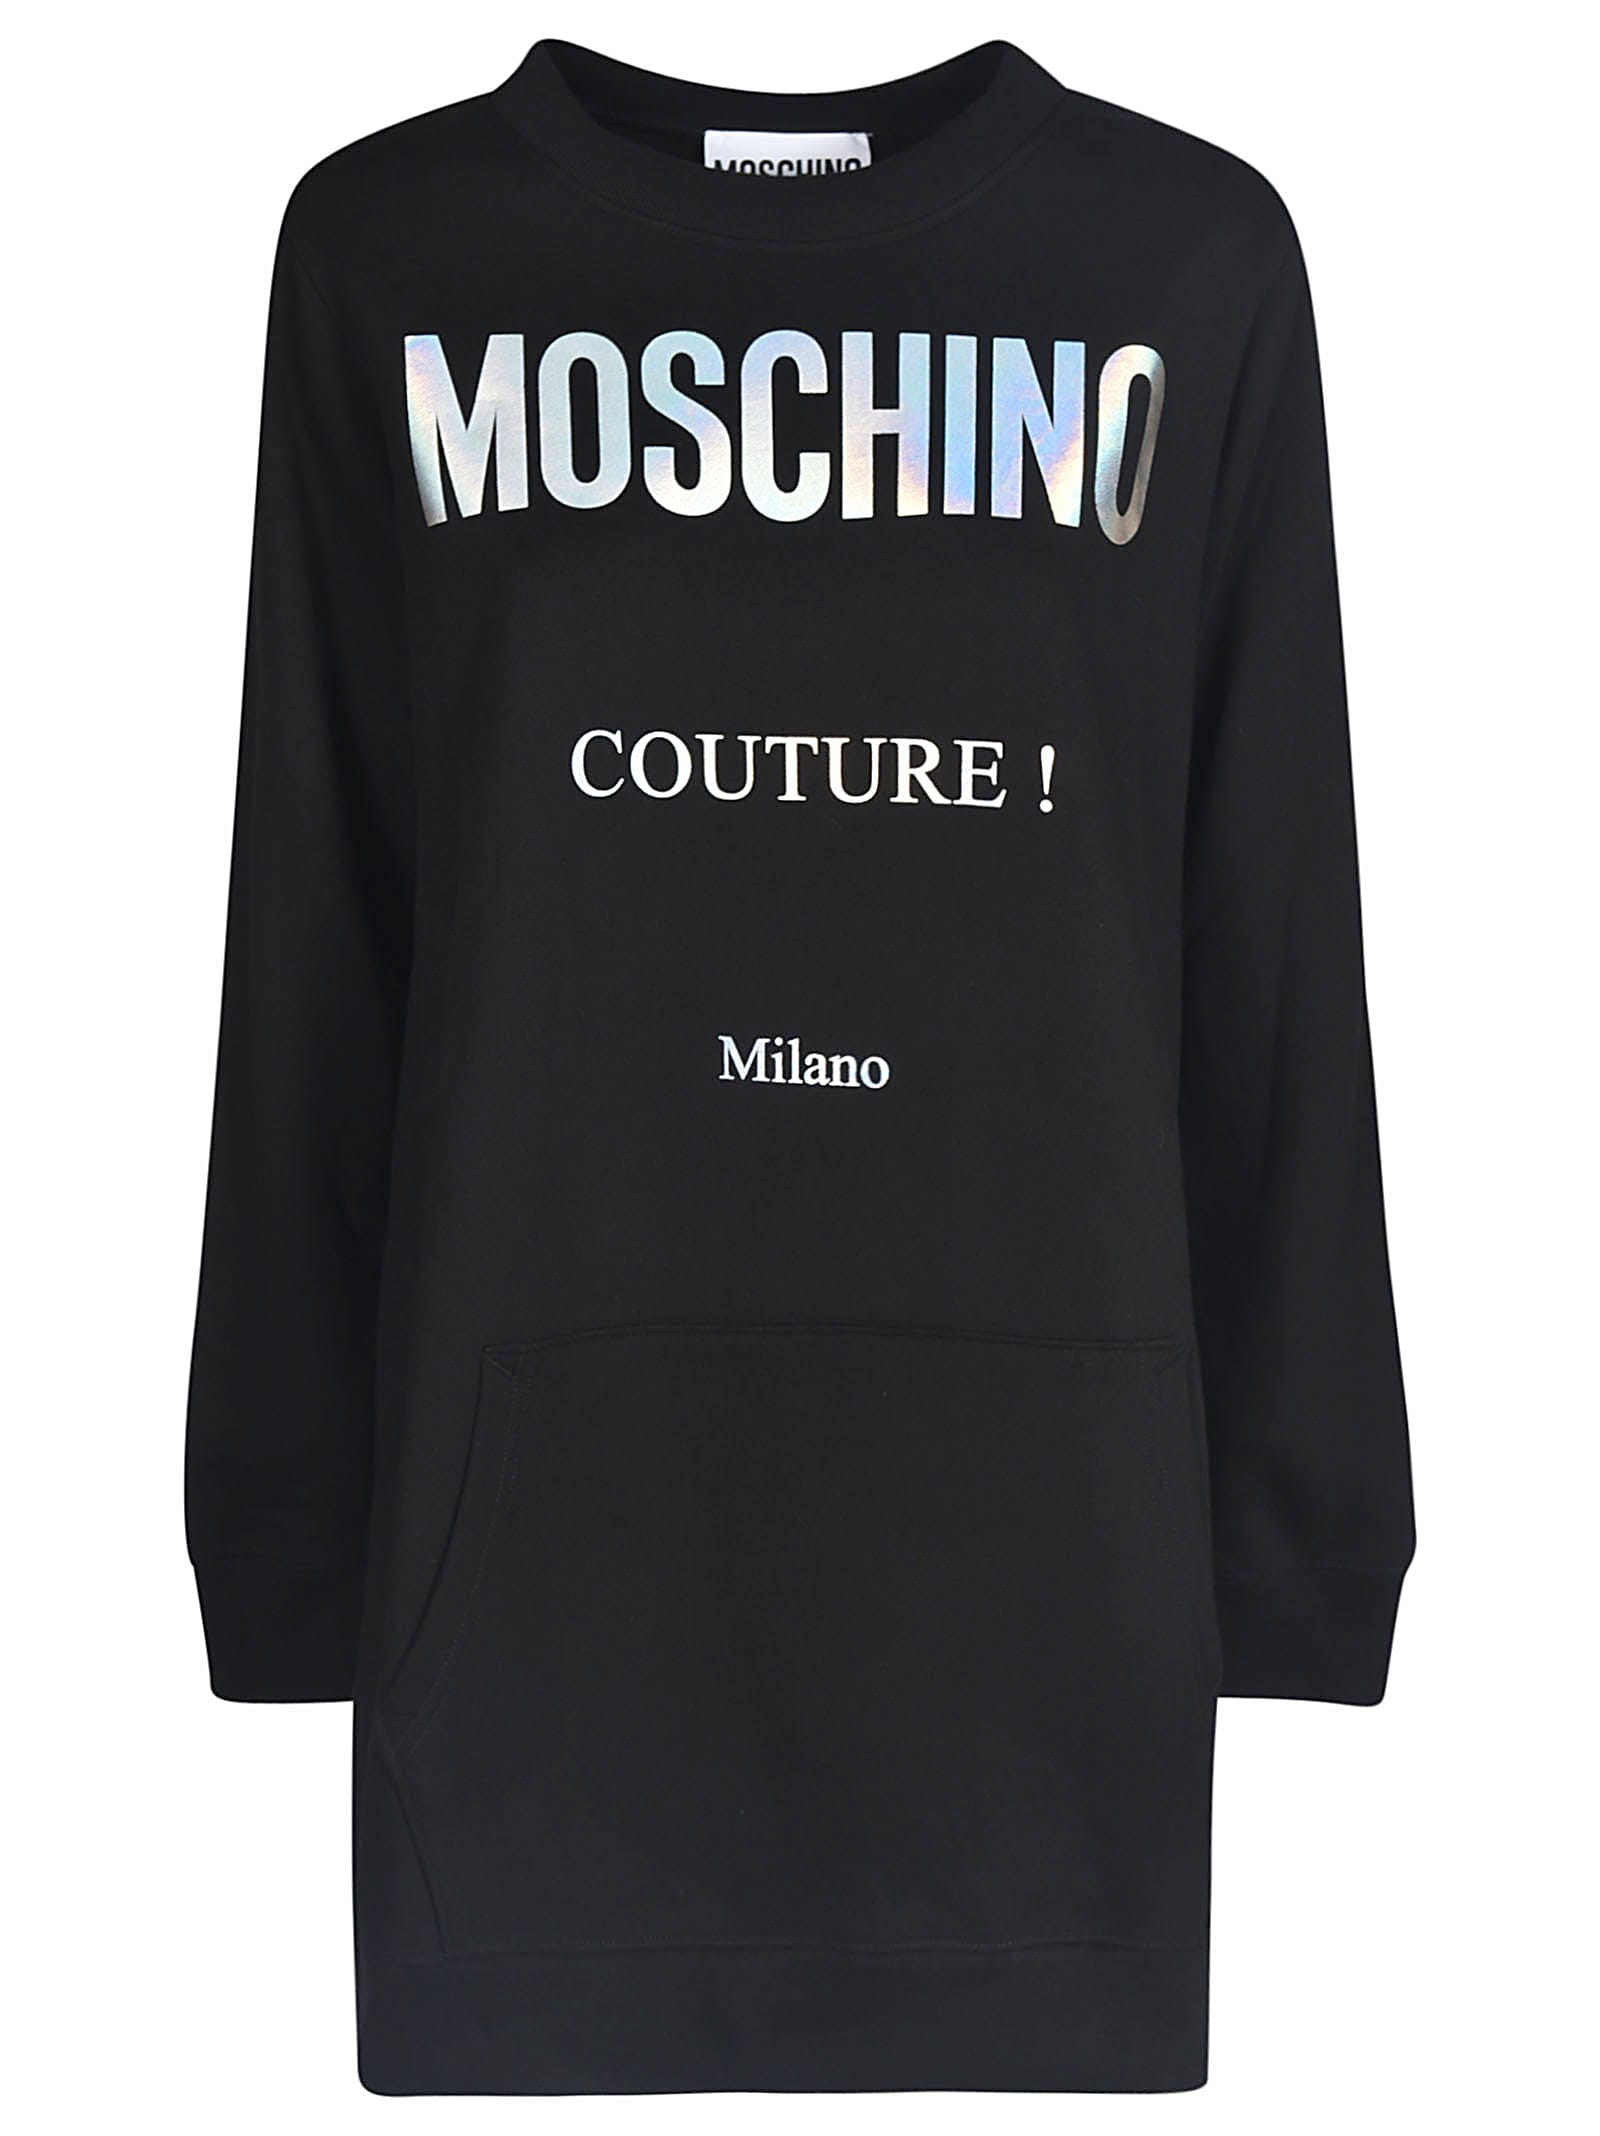 Buy Moschino Couture! Logo Sweatshirt Dress online, shop Moschino with free shipping